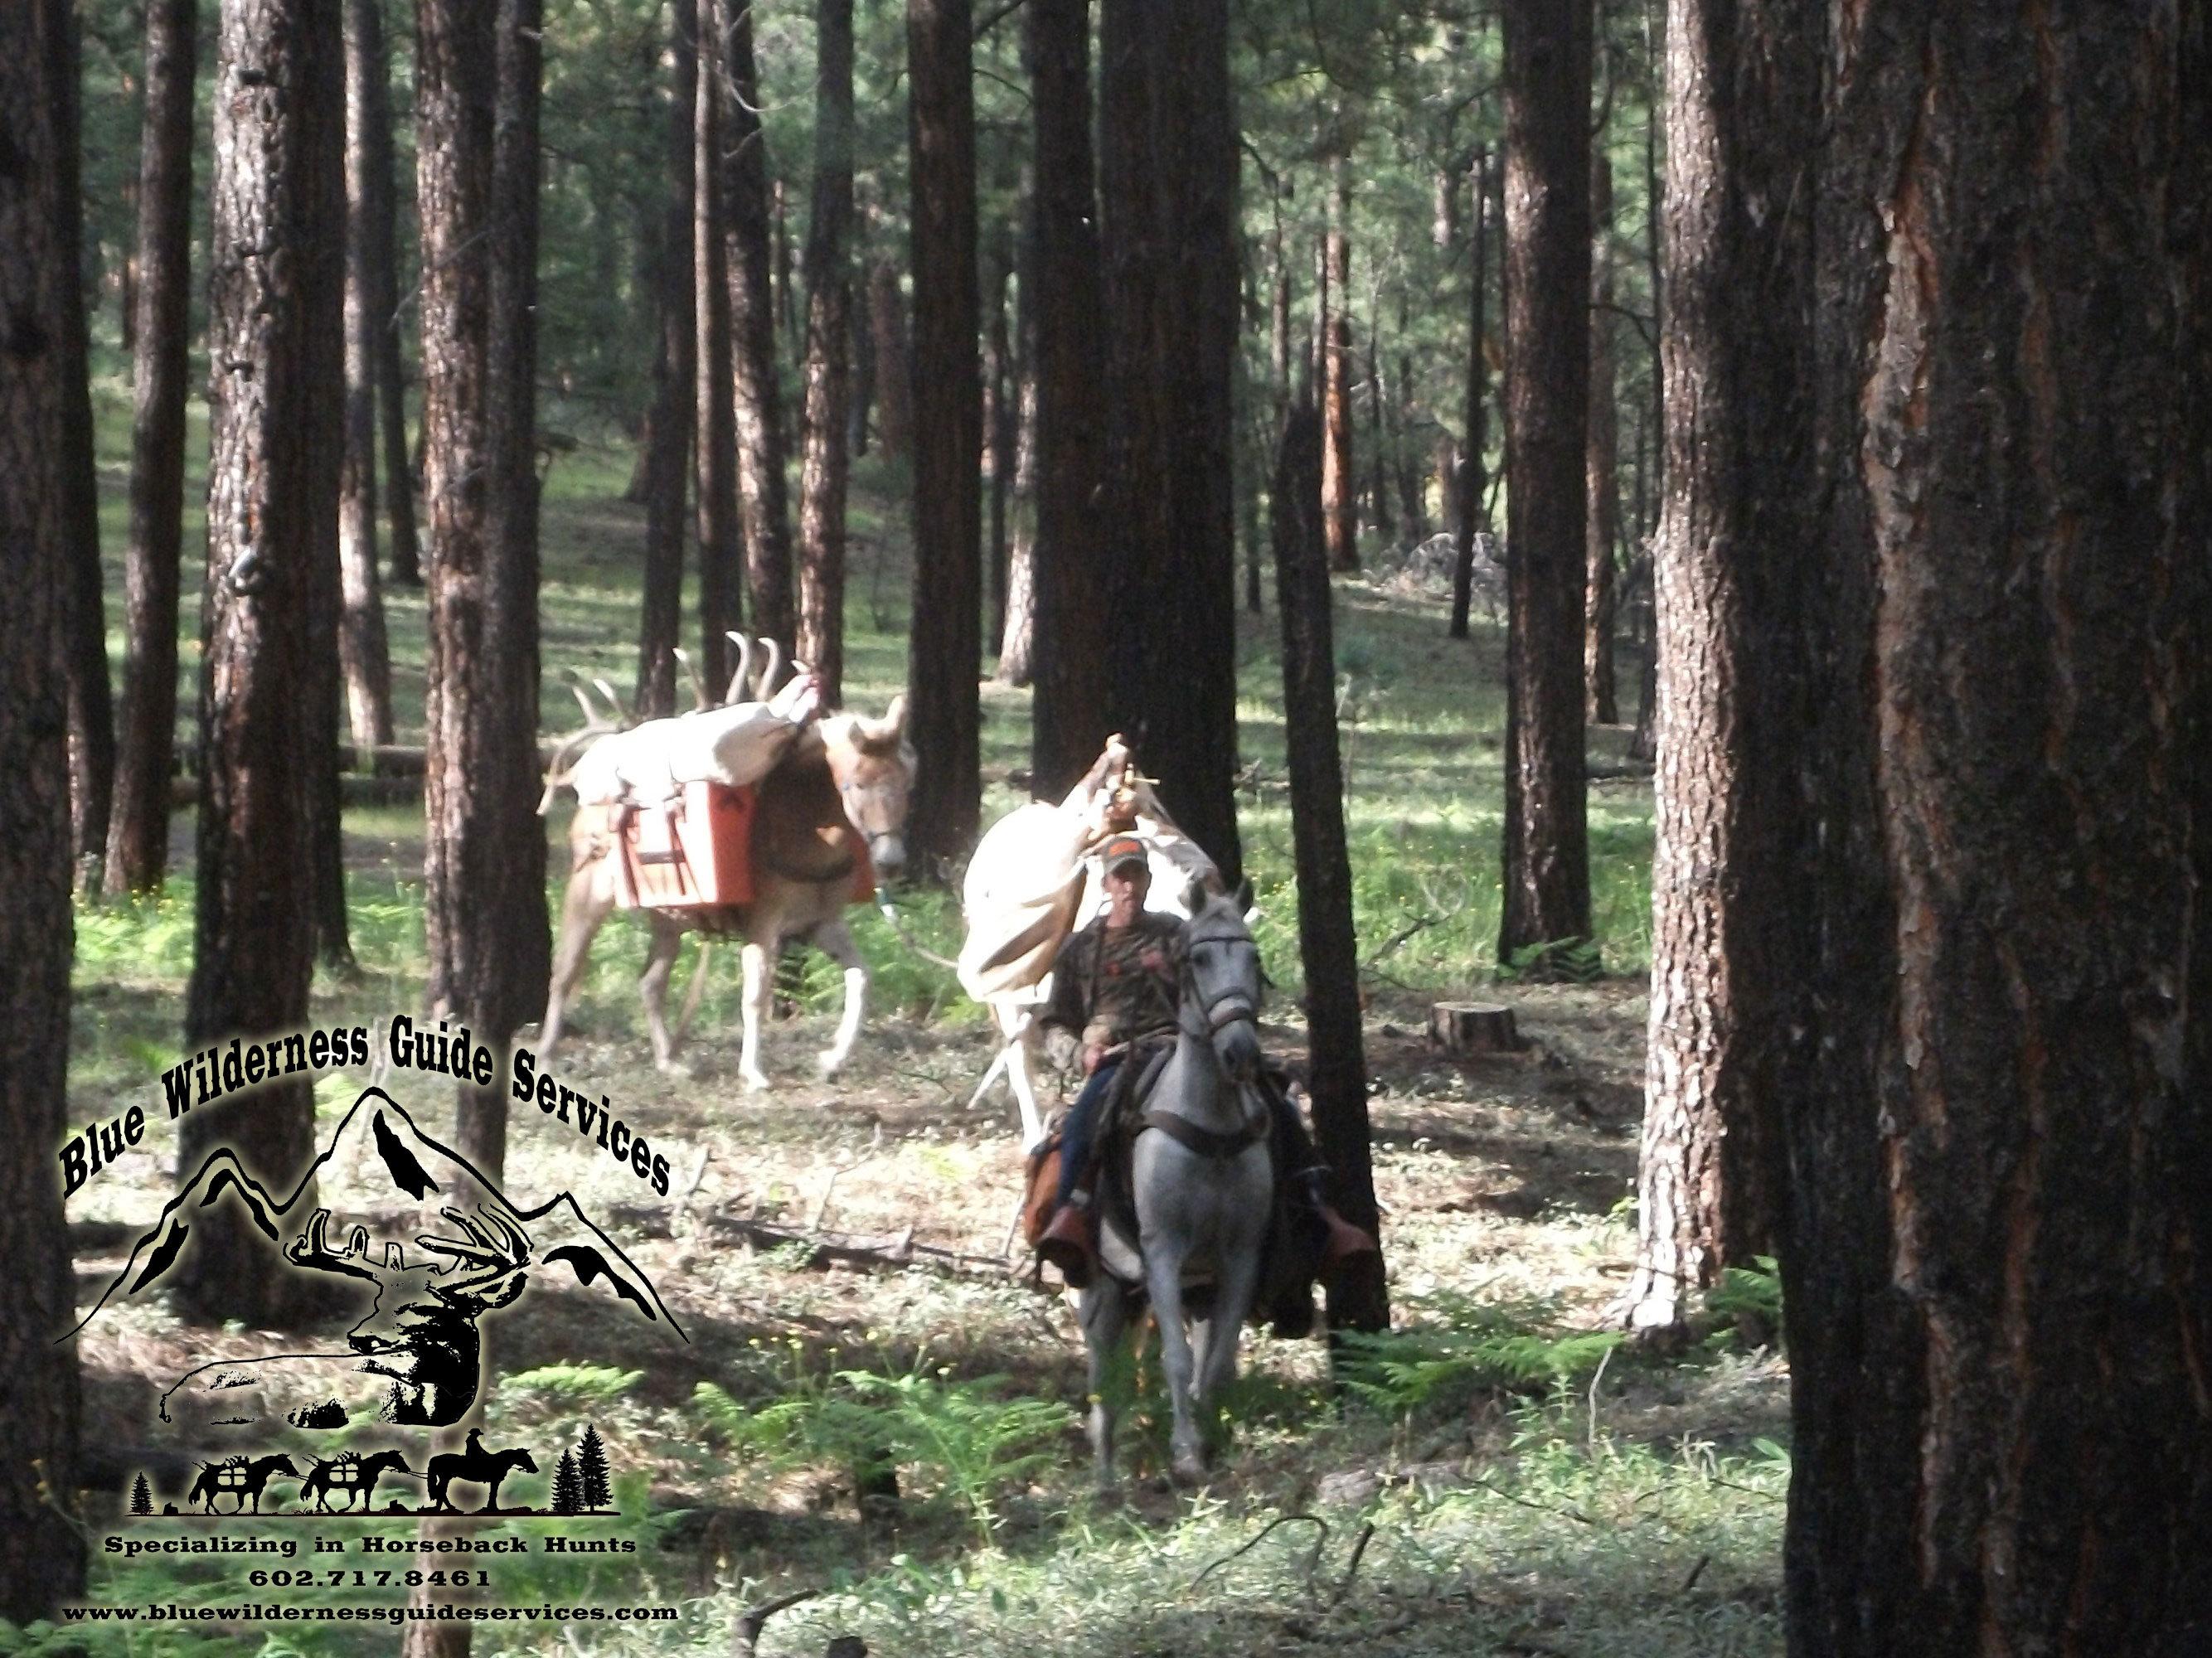 Blue Wilderness Guide Services: Archery Elk